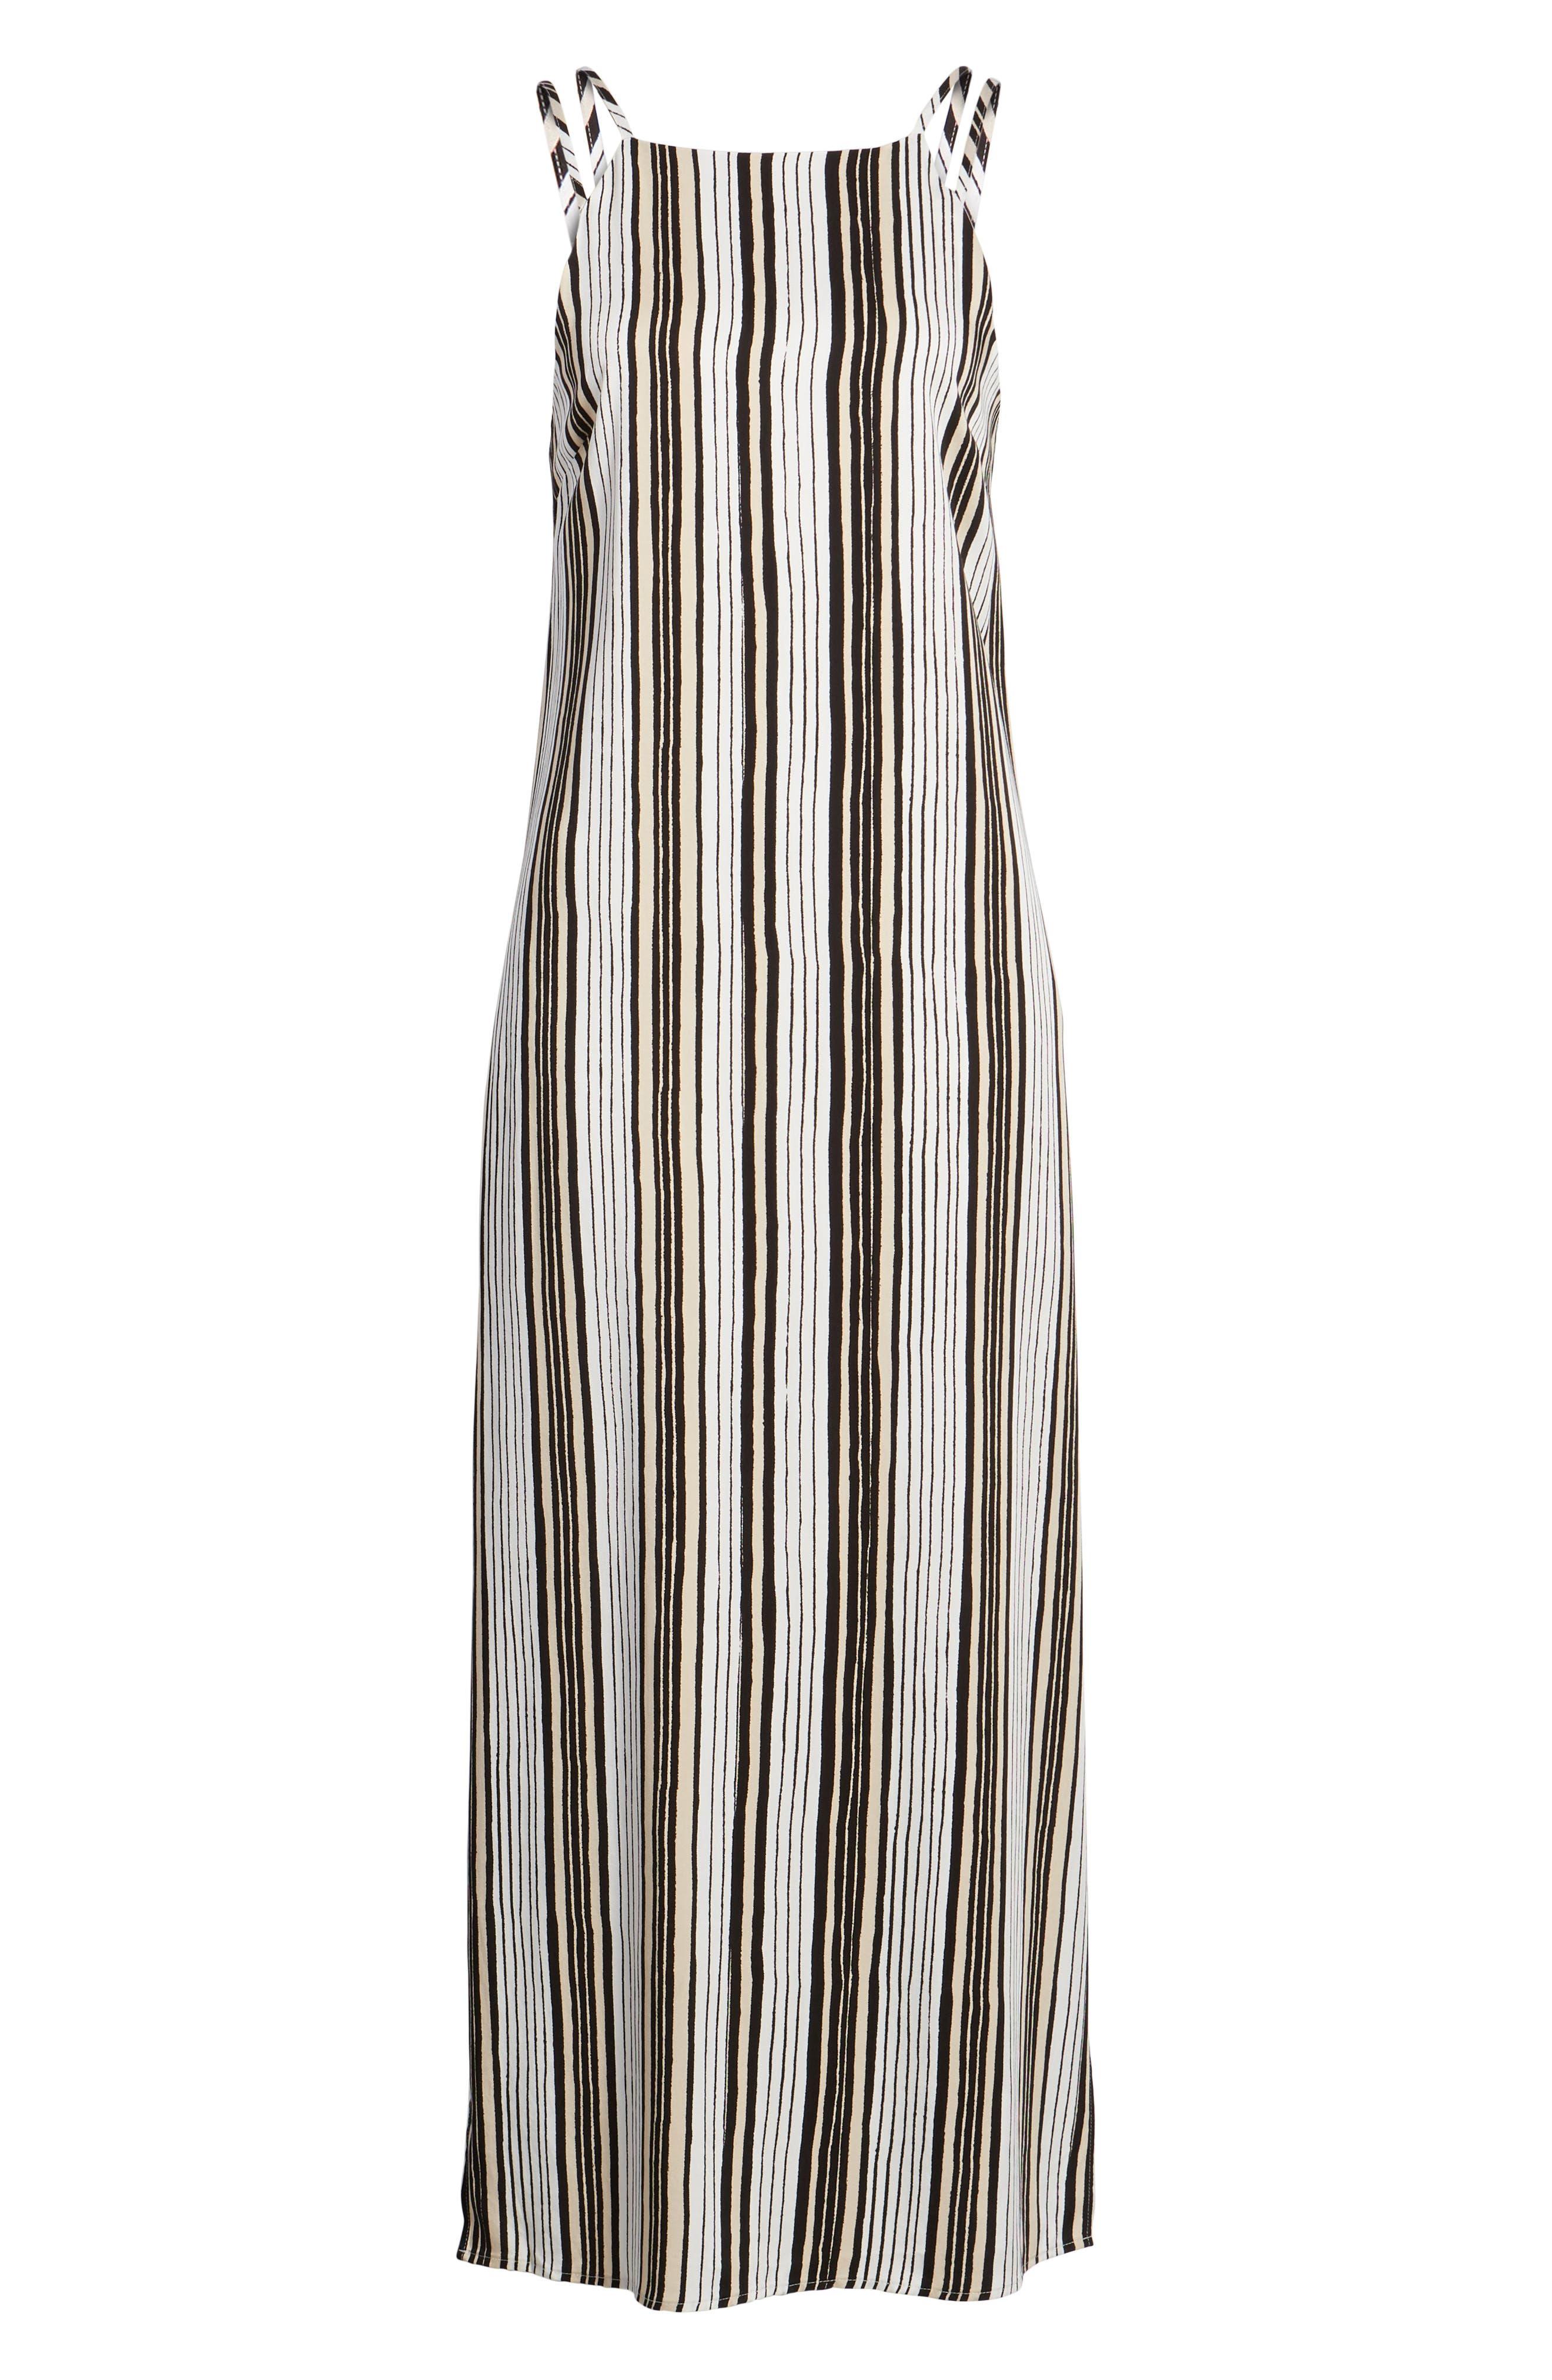 Corin Stripe Maxi Dress,                             Alternate thumbnail 7, color,                             Ivory